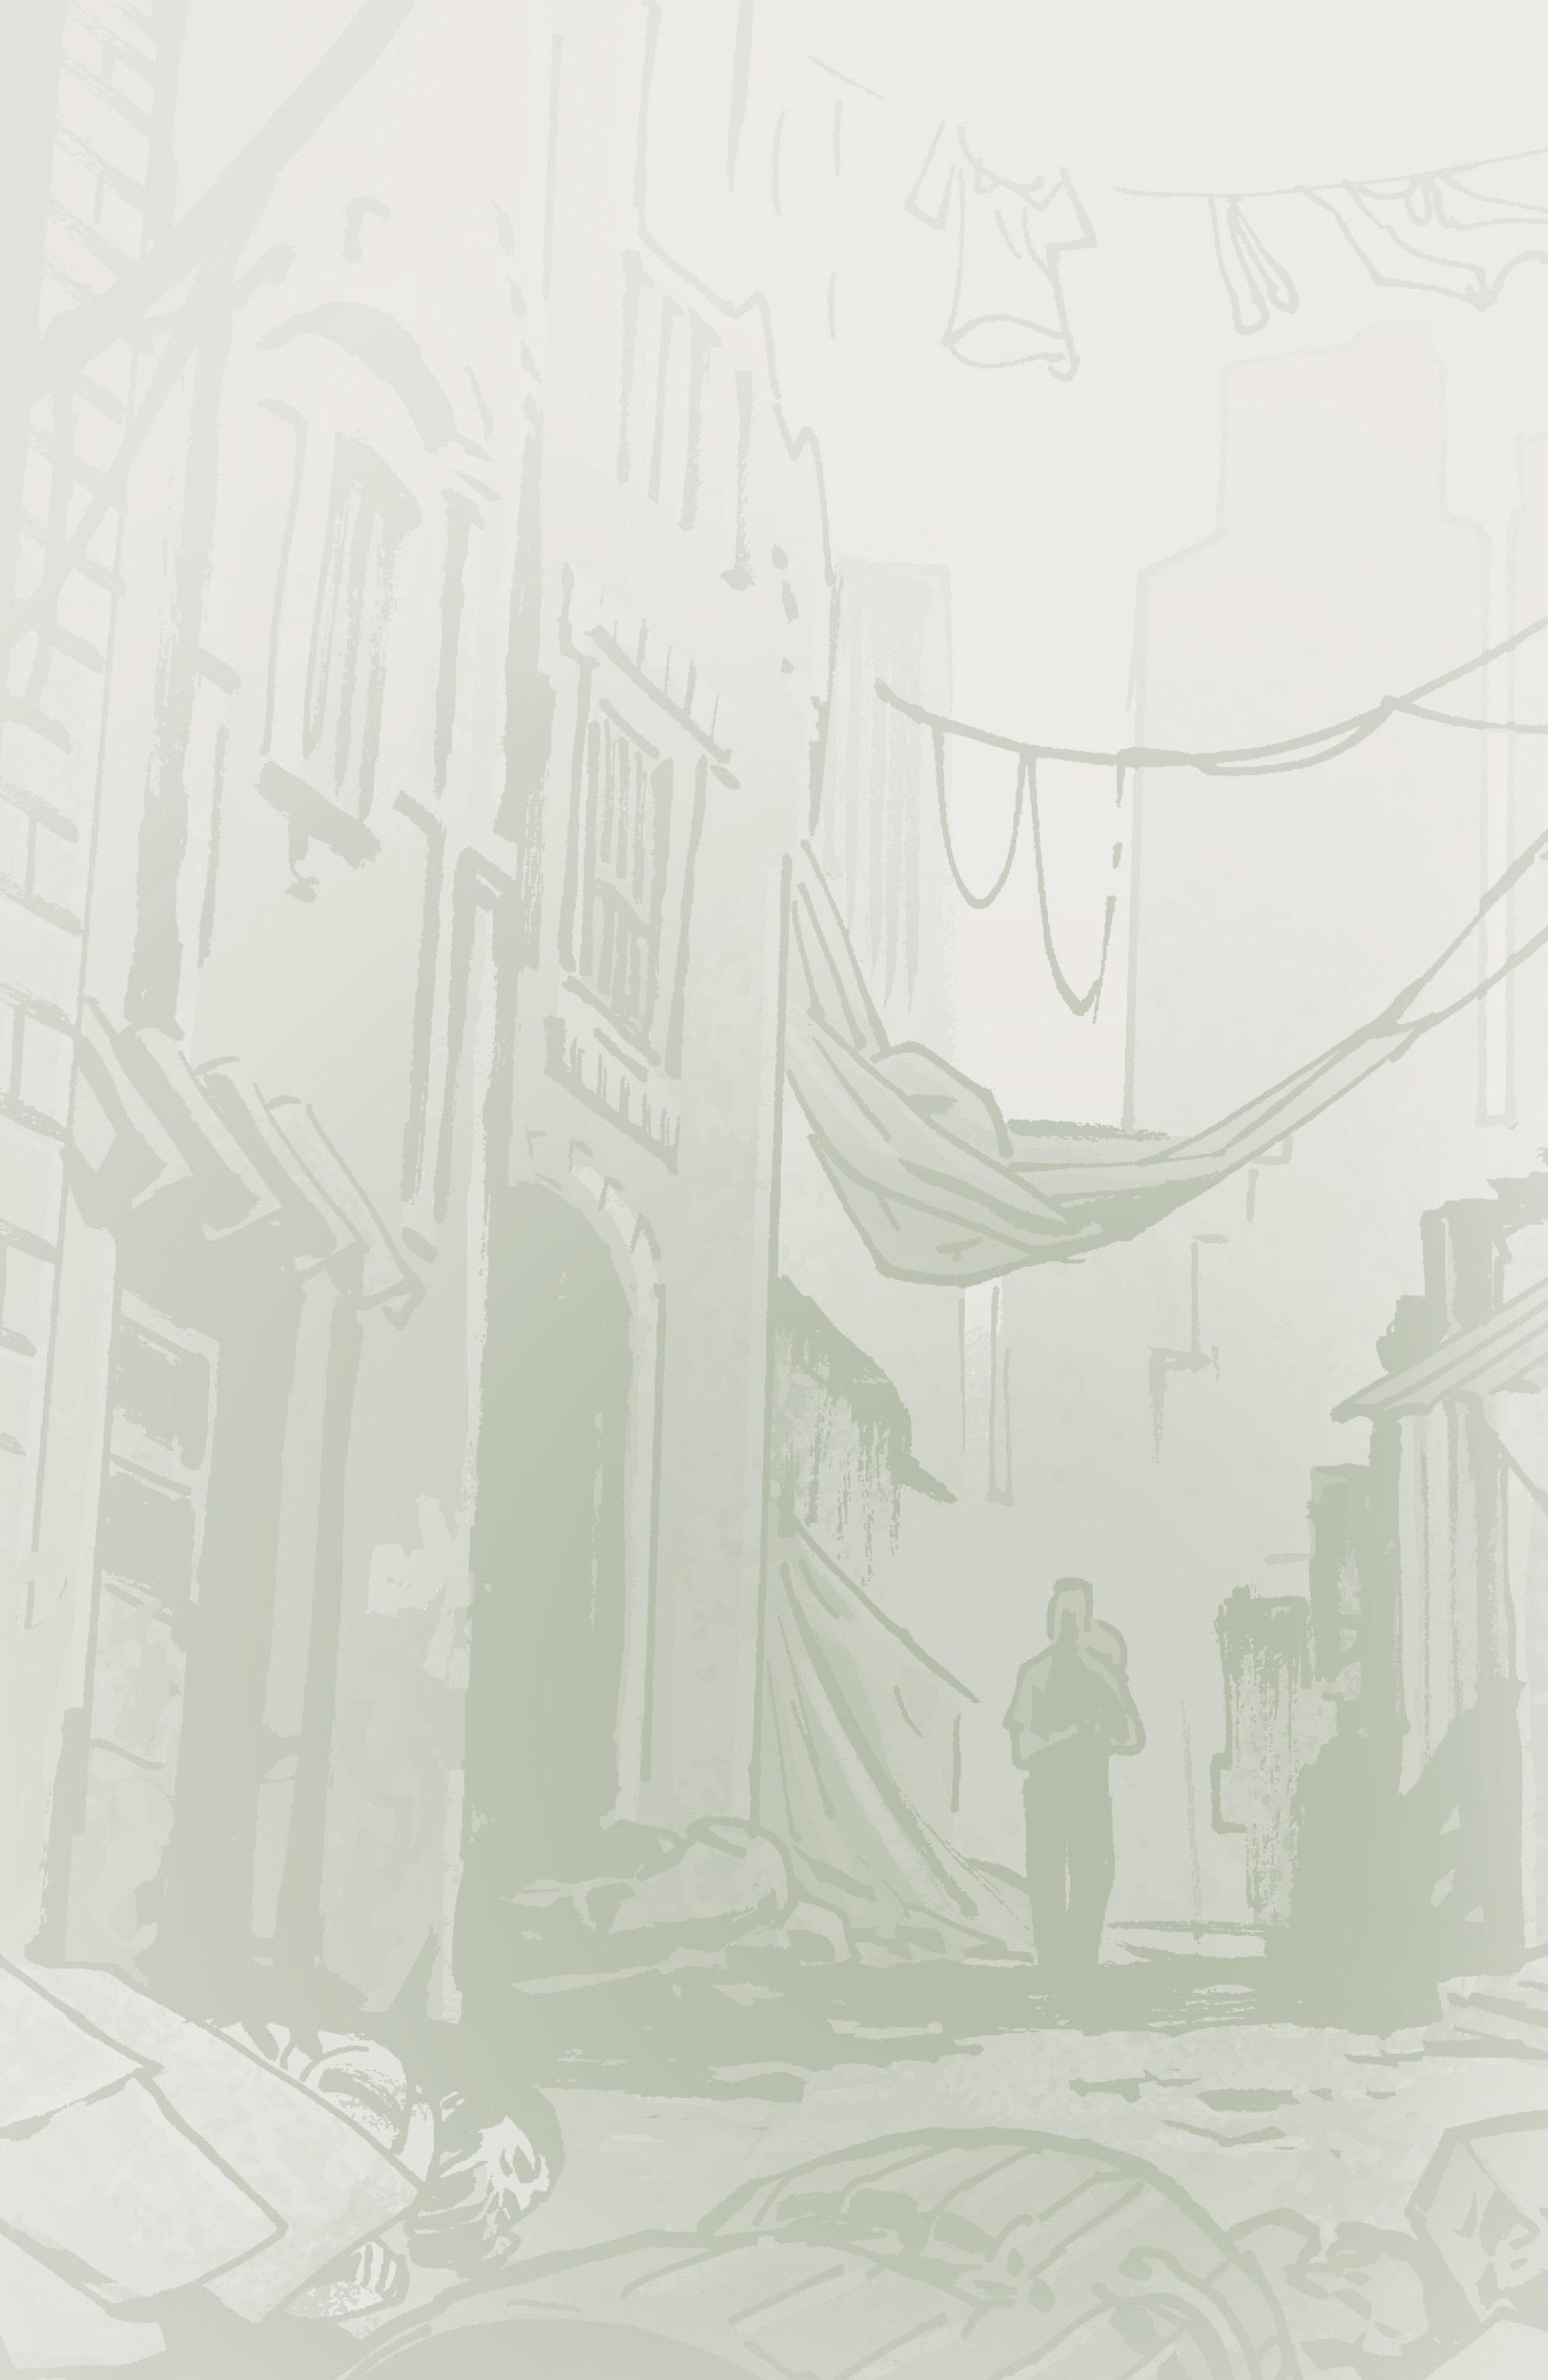 Read online Serenity Volume Three: The Shepherd's Tale comic -  Issue # TPB - 4